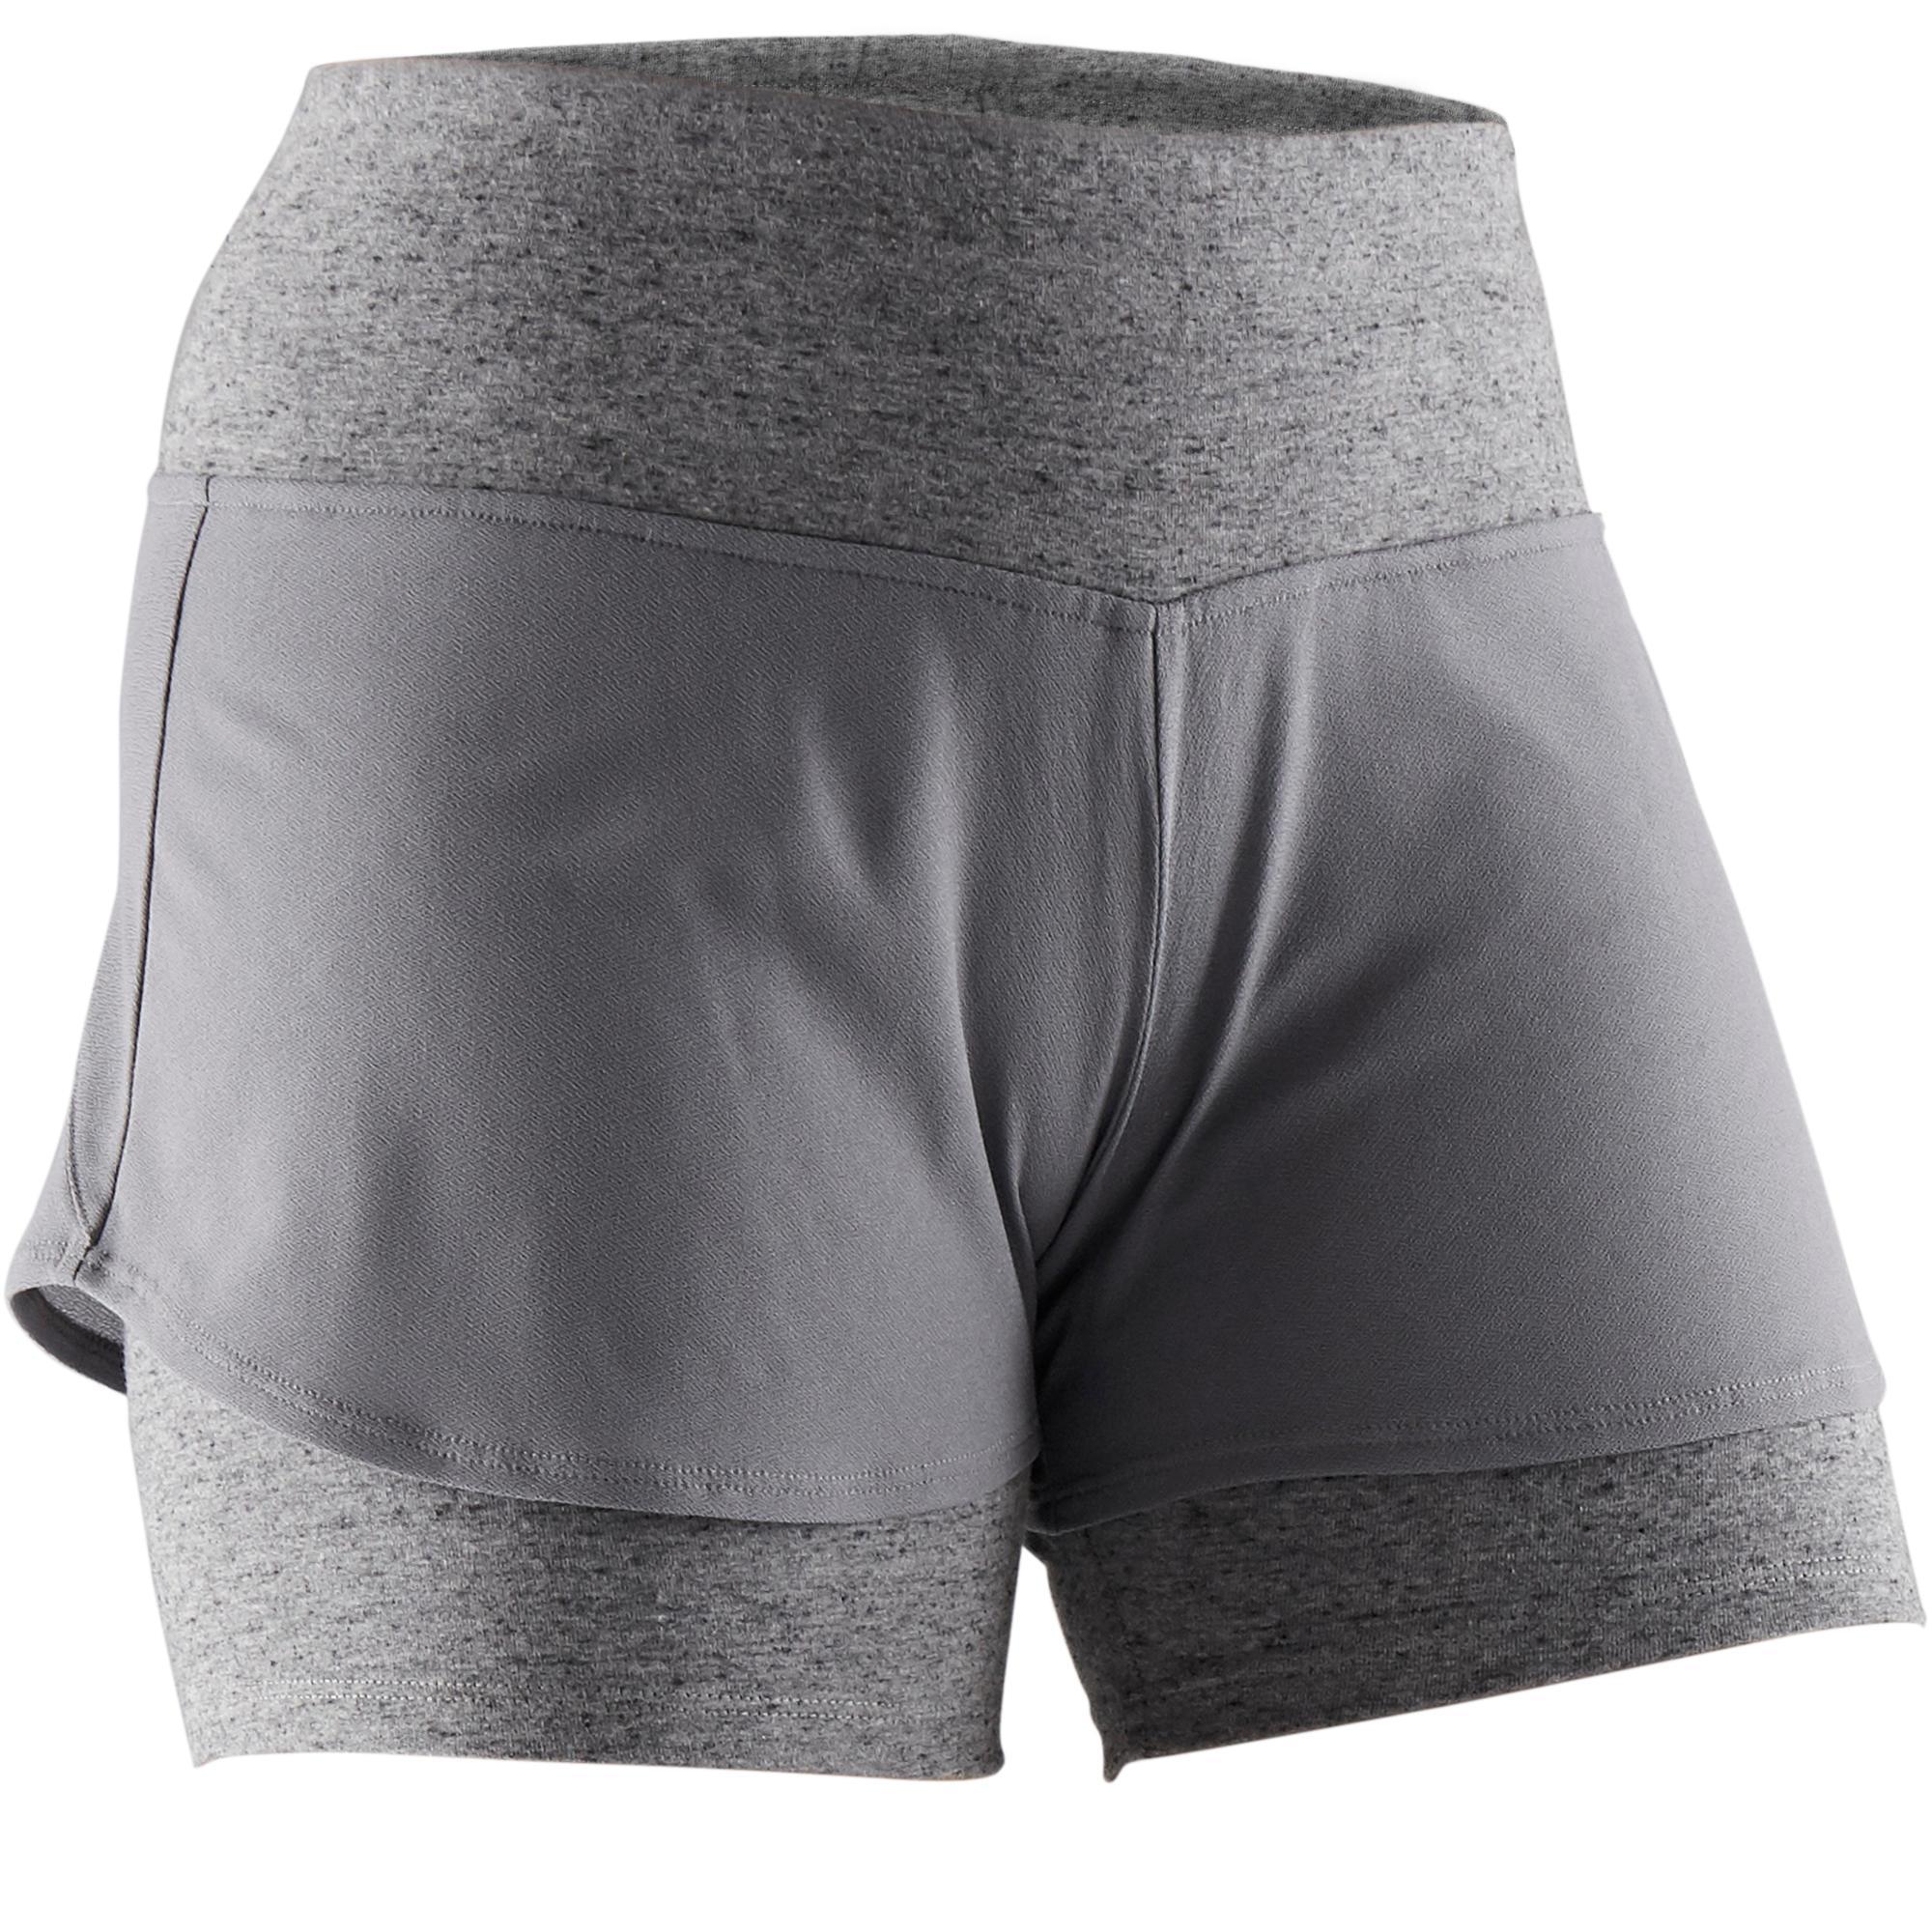 Domyos Short 520 Pilates Gym douce femme gris - Domyos